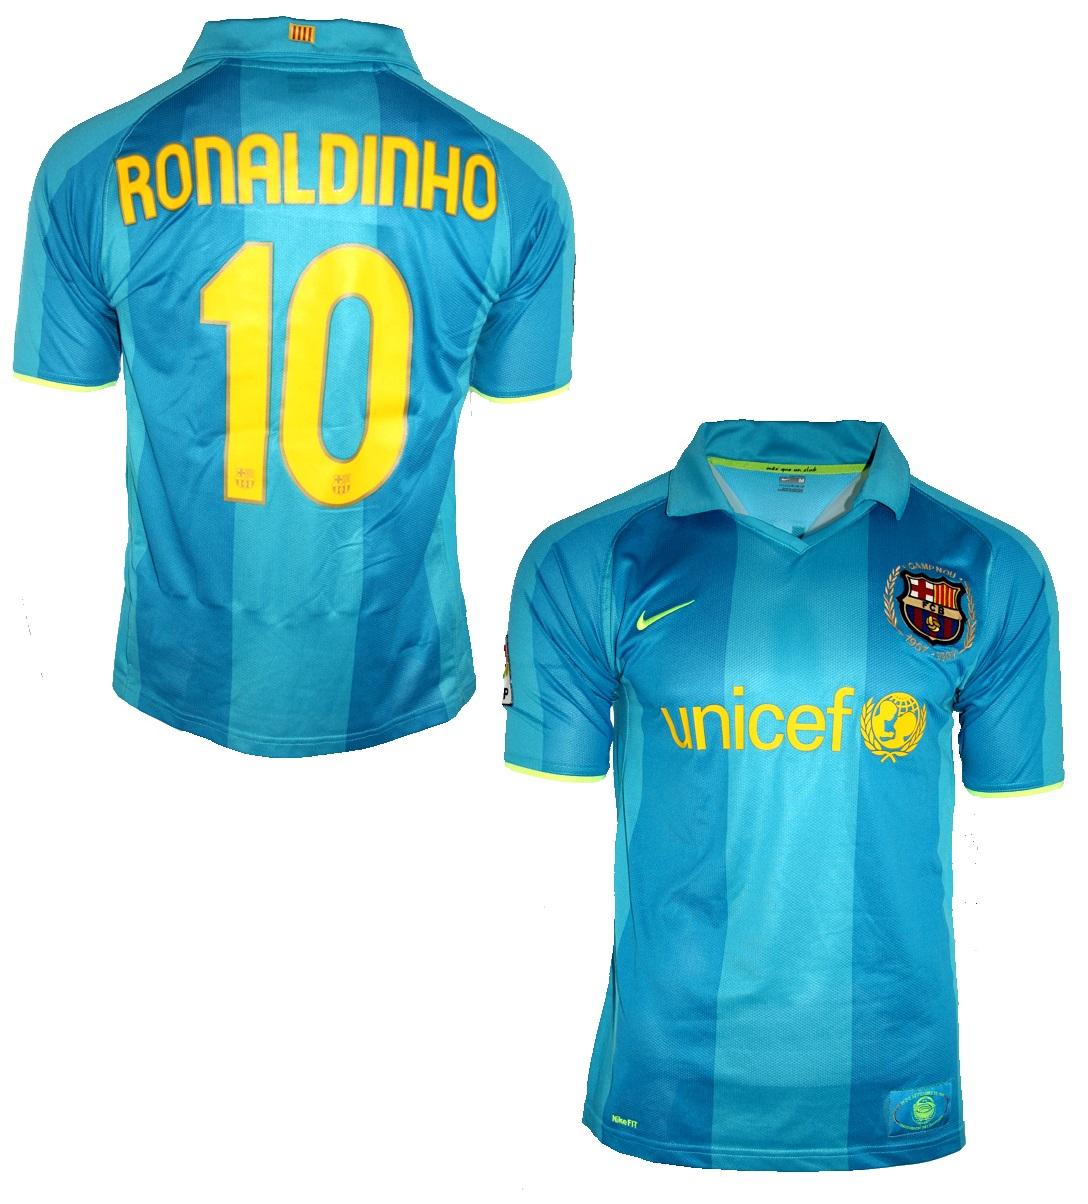 Nike FC Barcelona jersey 10 Ronaldinho 2007/08 blue Unicef men's  S(M/L/XL/XXL futbol shirt buy & cheap online shop - spieler-trikot.de  retro, vintage & old football shirts & jersey from super stars